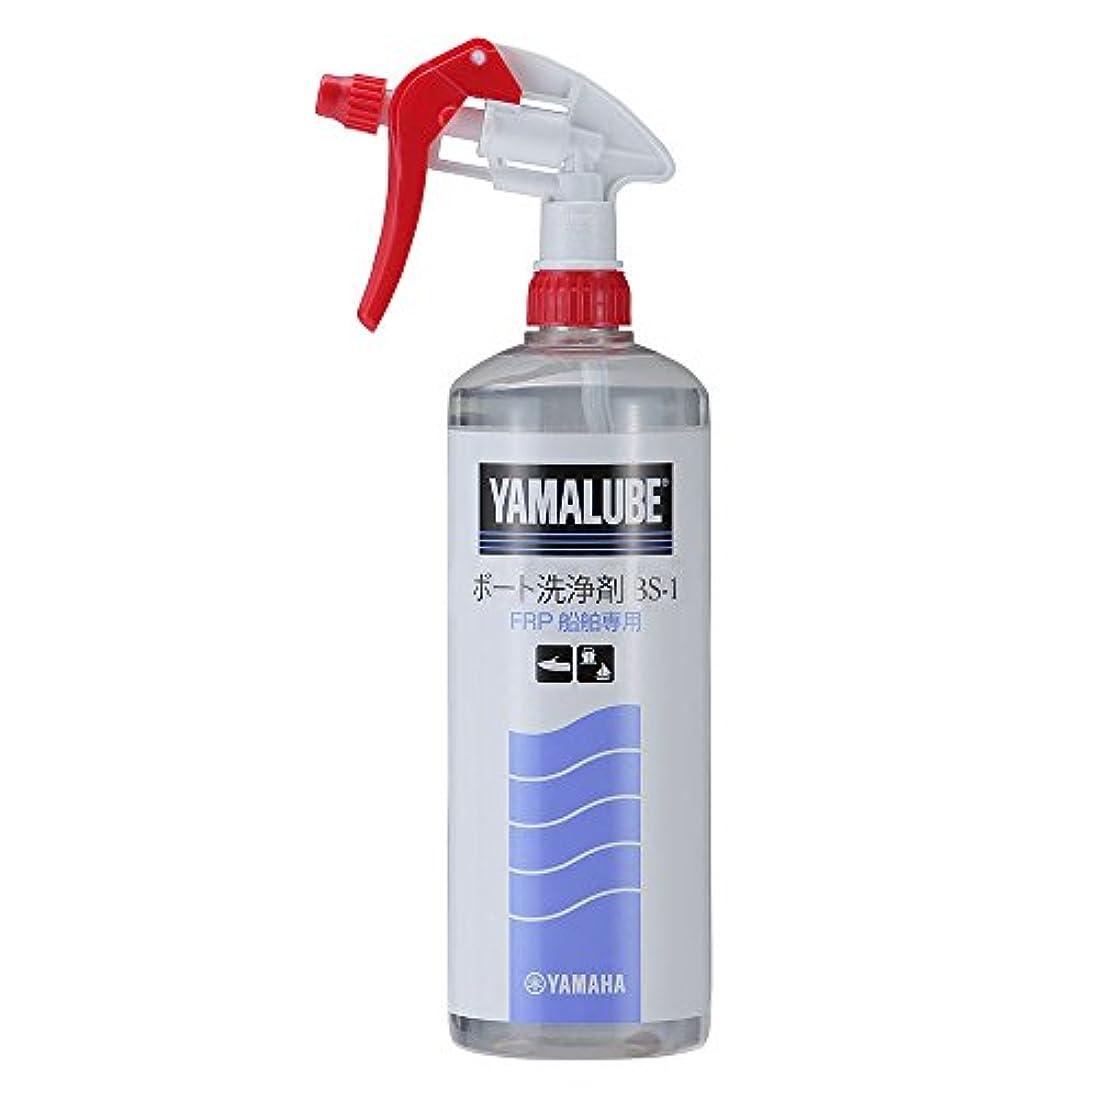 【YAMAHA/ヤマハ】ヤマルーブ ボート洗浄剤(黄ばみ汚れ専用) BS-1 1リットル 90790-74060 洗浄用品 メンテナンス